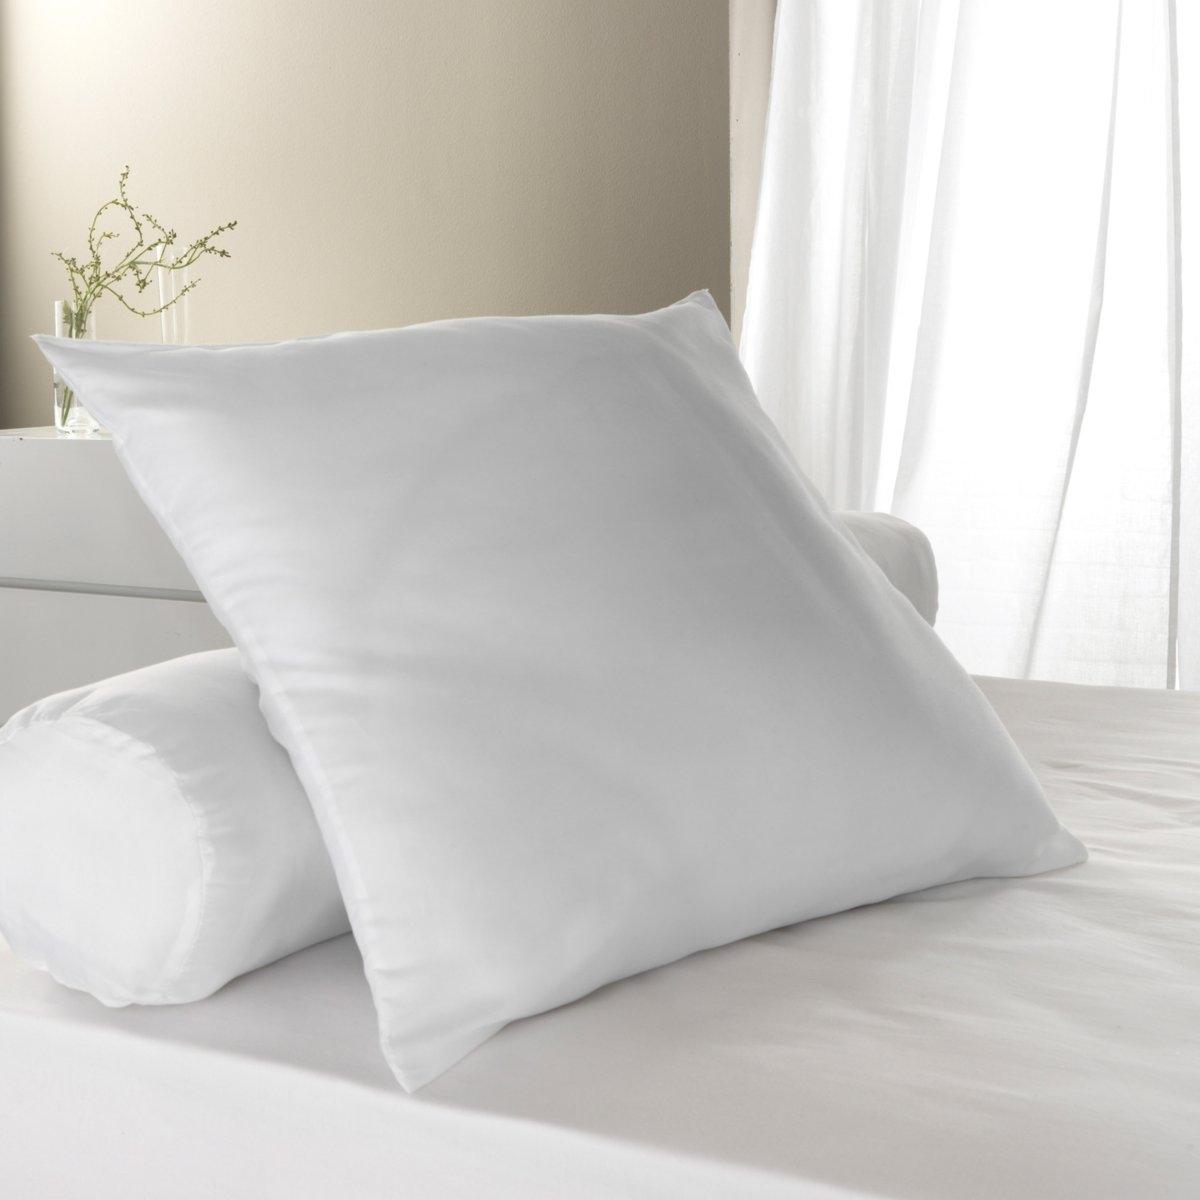 Подушка из синтетики подушка из синтетики